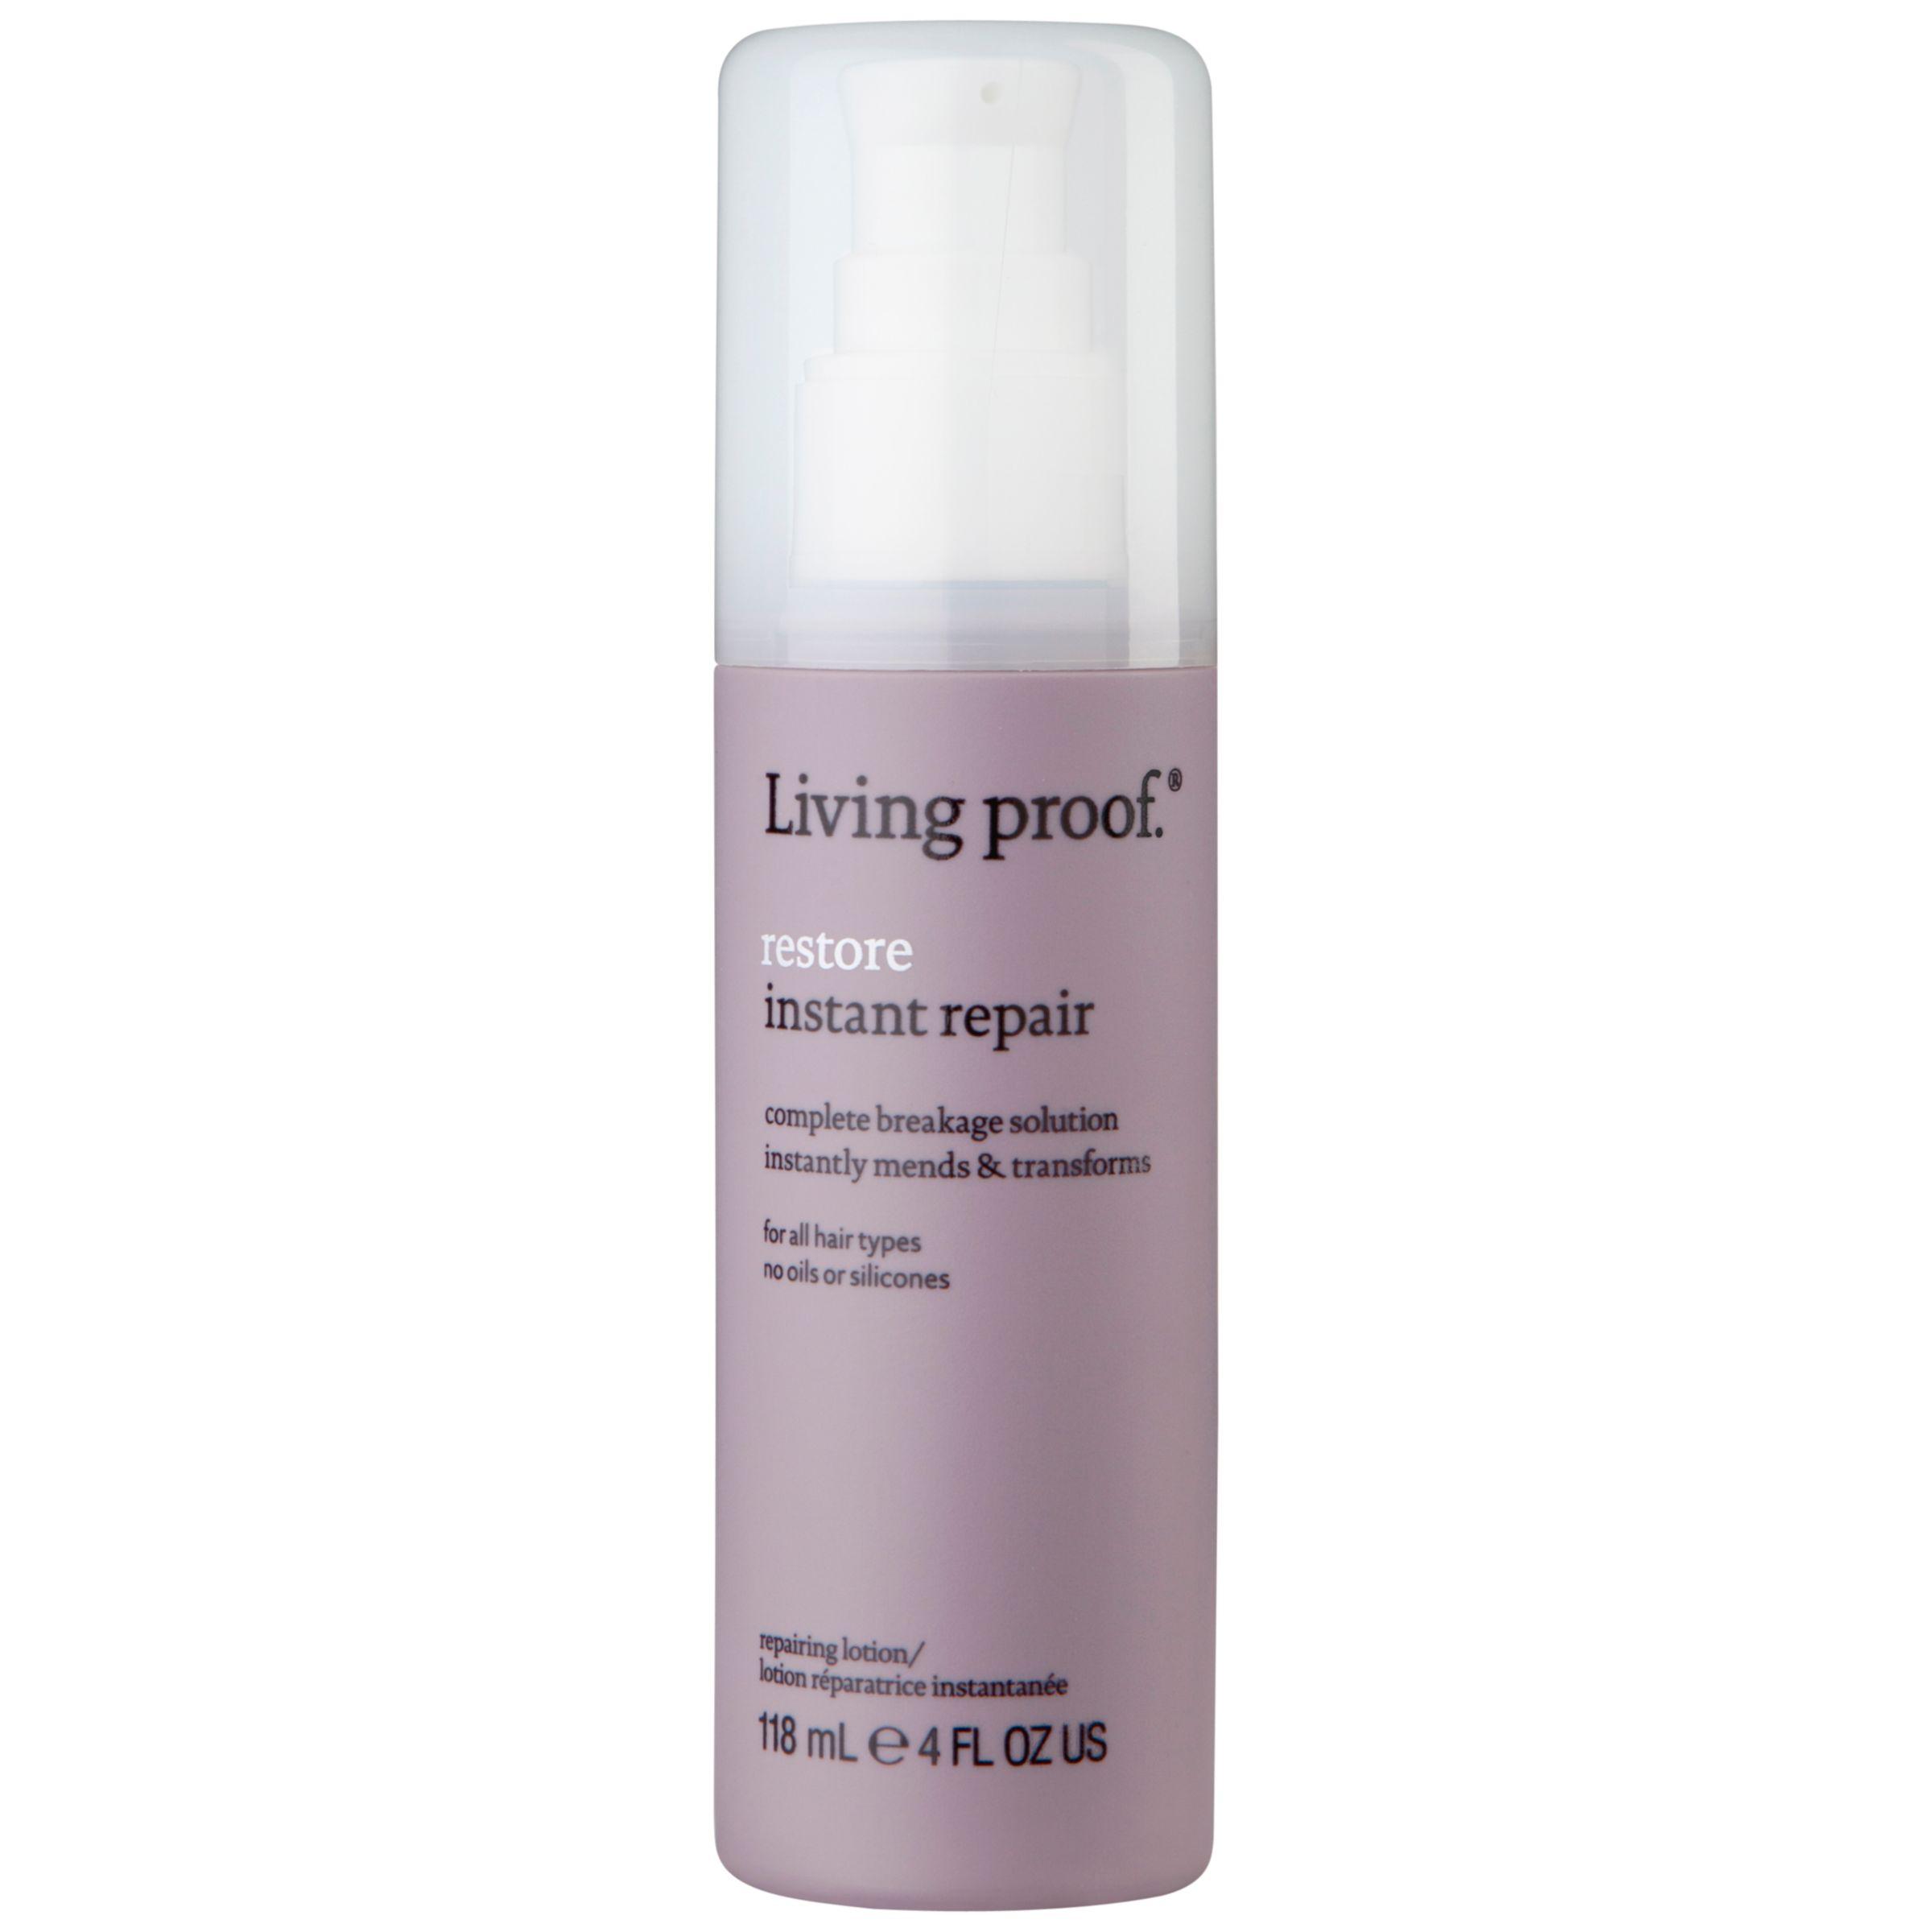 Living Proof Living Proof Restore Target Repair Hair Cream, 118ml